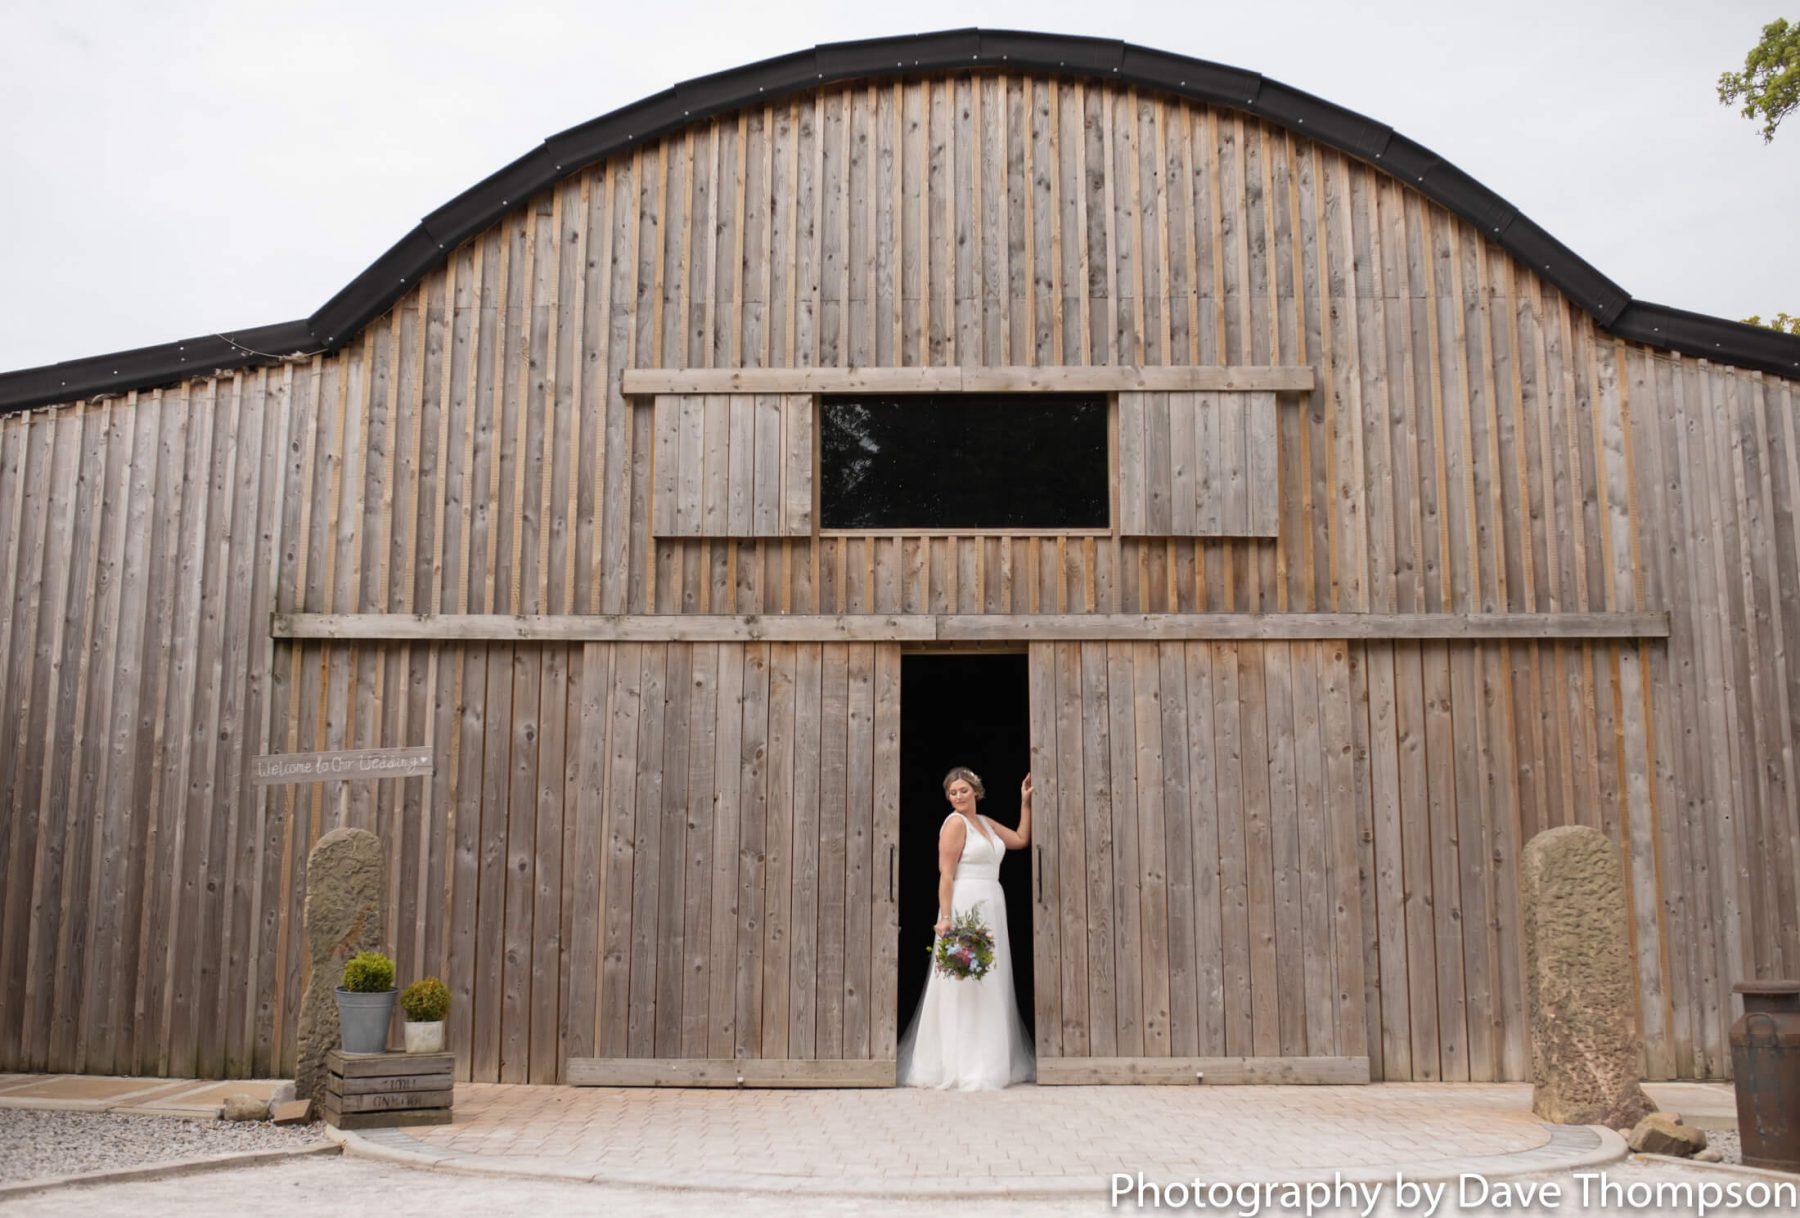 A bride in the doorway of Alcumlow Barn wedding venue